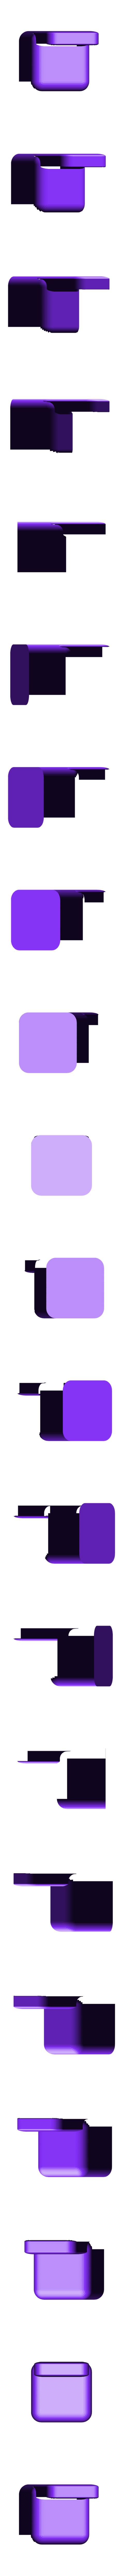 seat.stl Download free STL file Flying Saucer • 3D print model, NohaBody